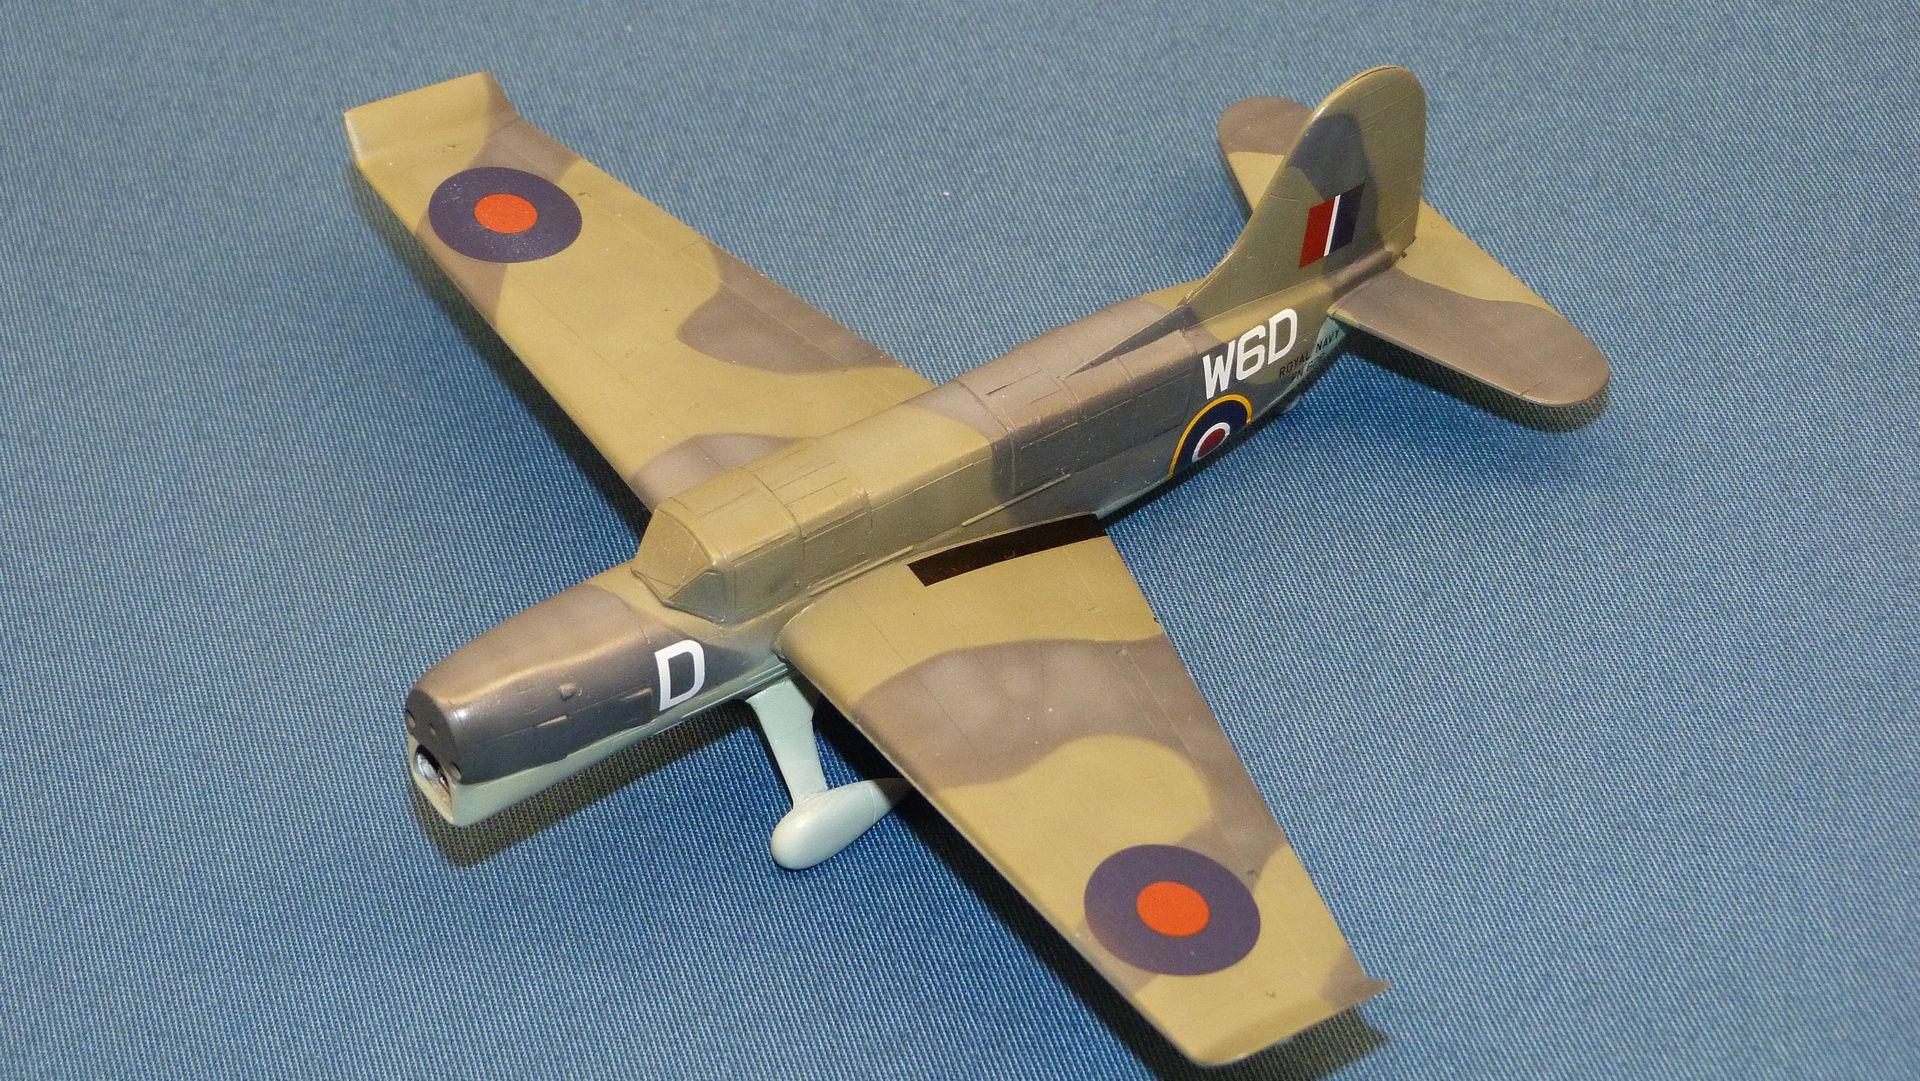 Julklappsbygge: Curtiss Seamew Mk1, Sword 1/72 - Sida 3 46543500395_5454012b0b_o